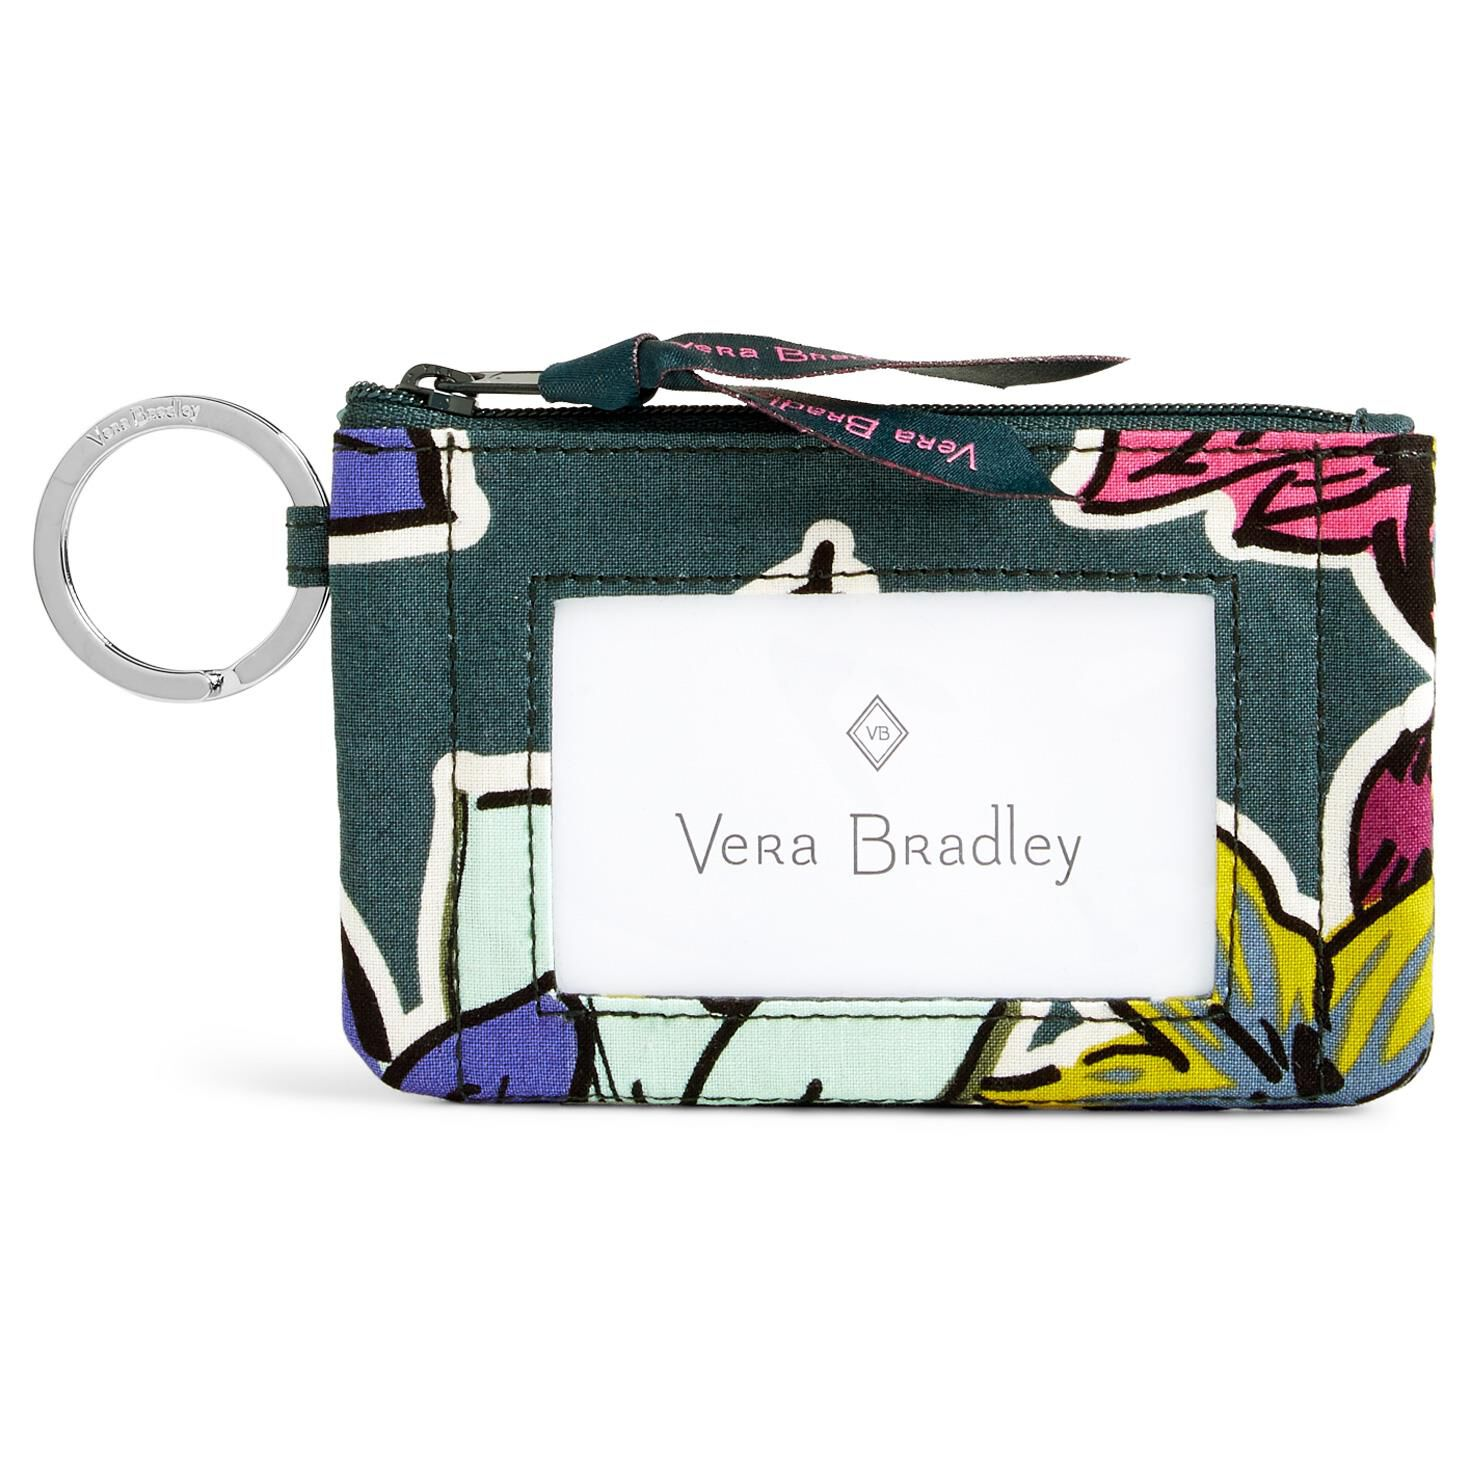 Vera Bradley Zip ID Case in Falling Flowers - Handbags & Purses ...